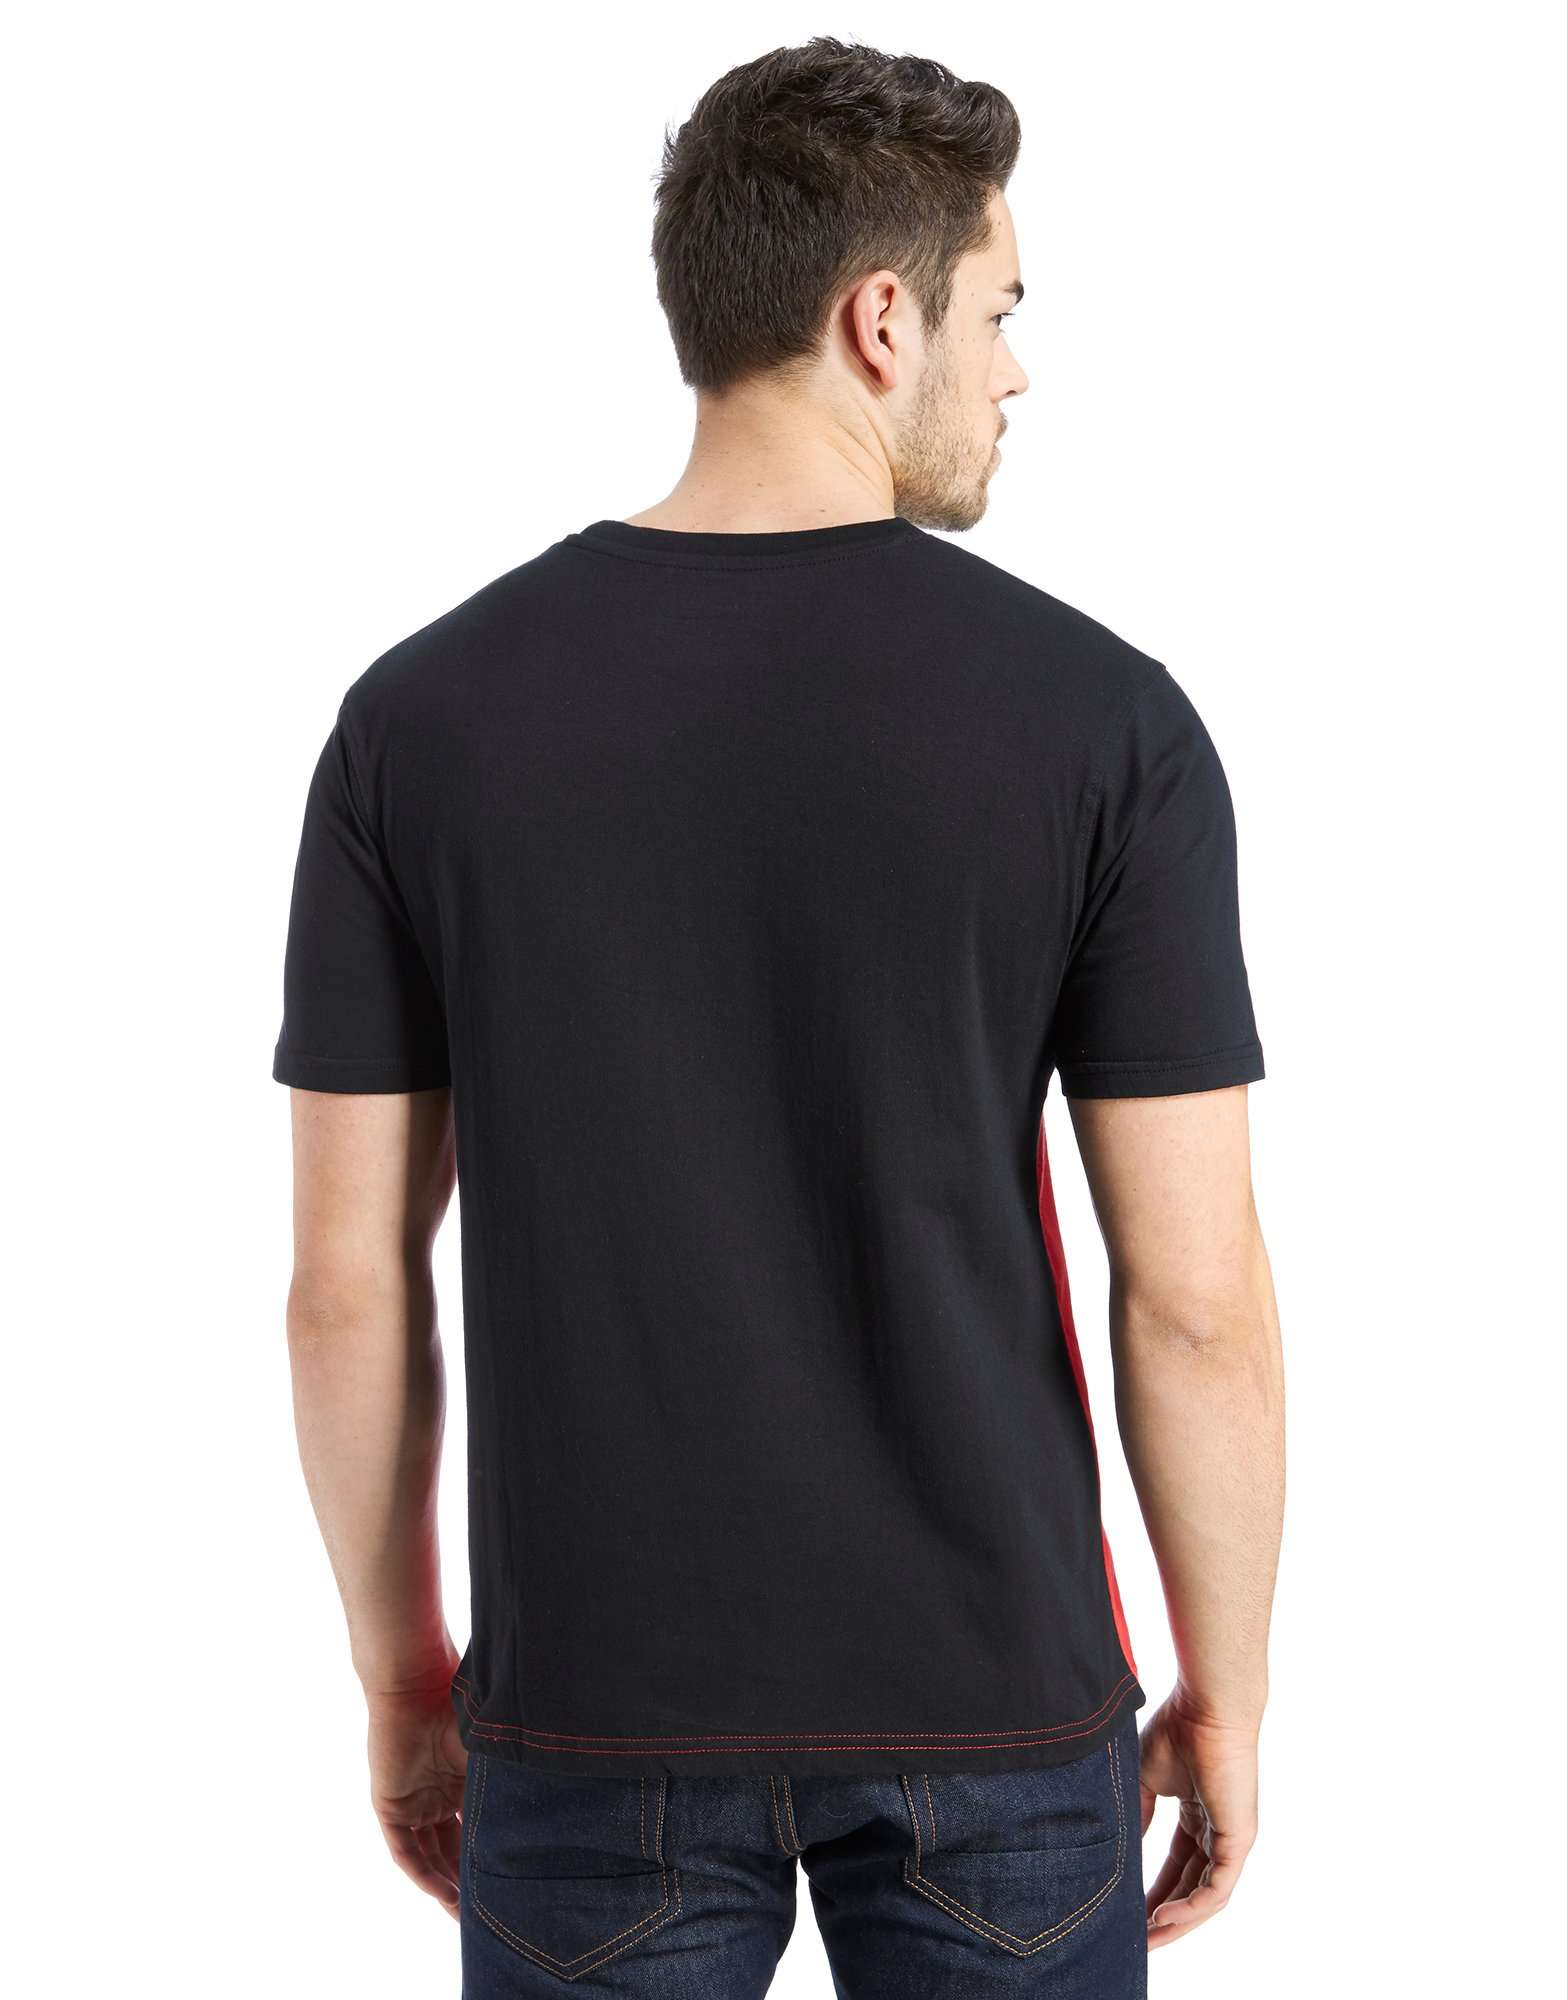 McKenzie Gunson T-Shirt